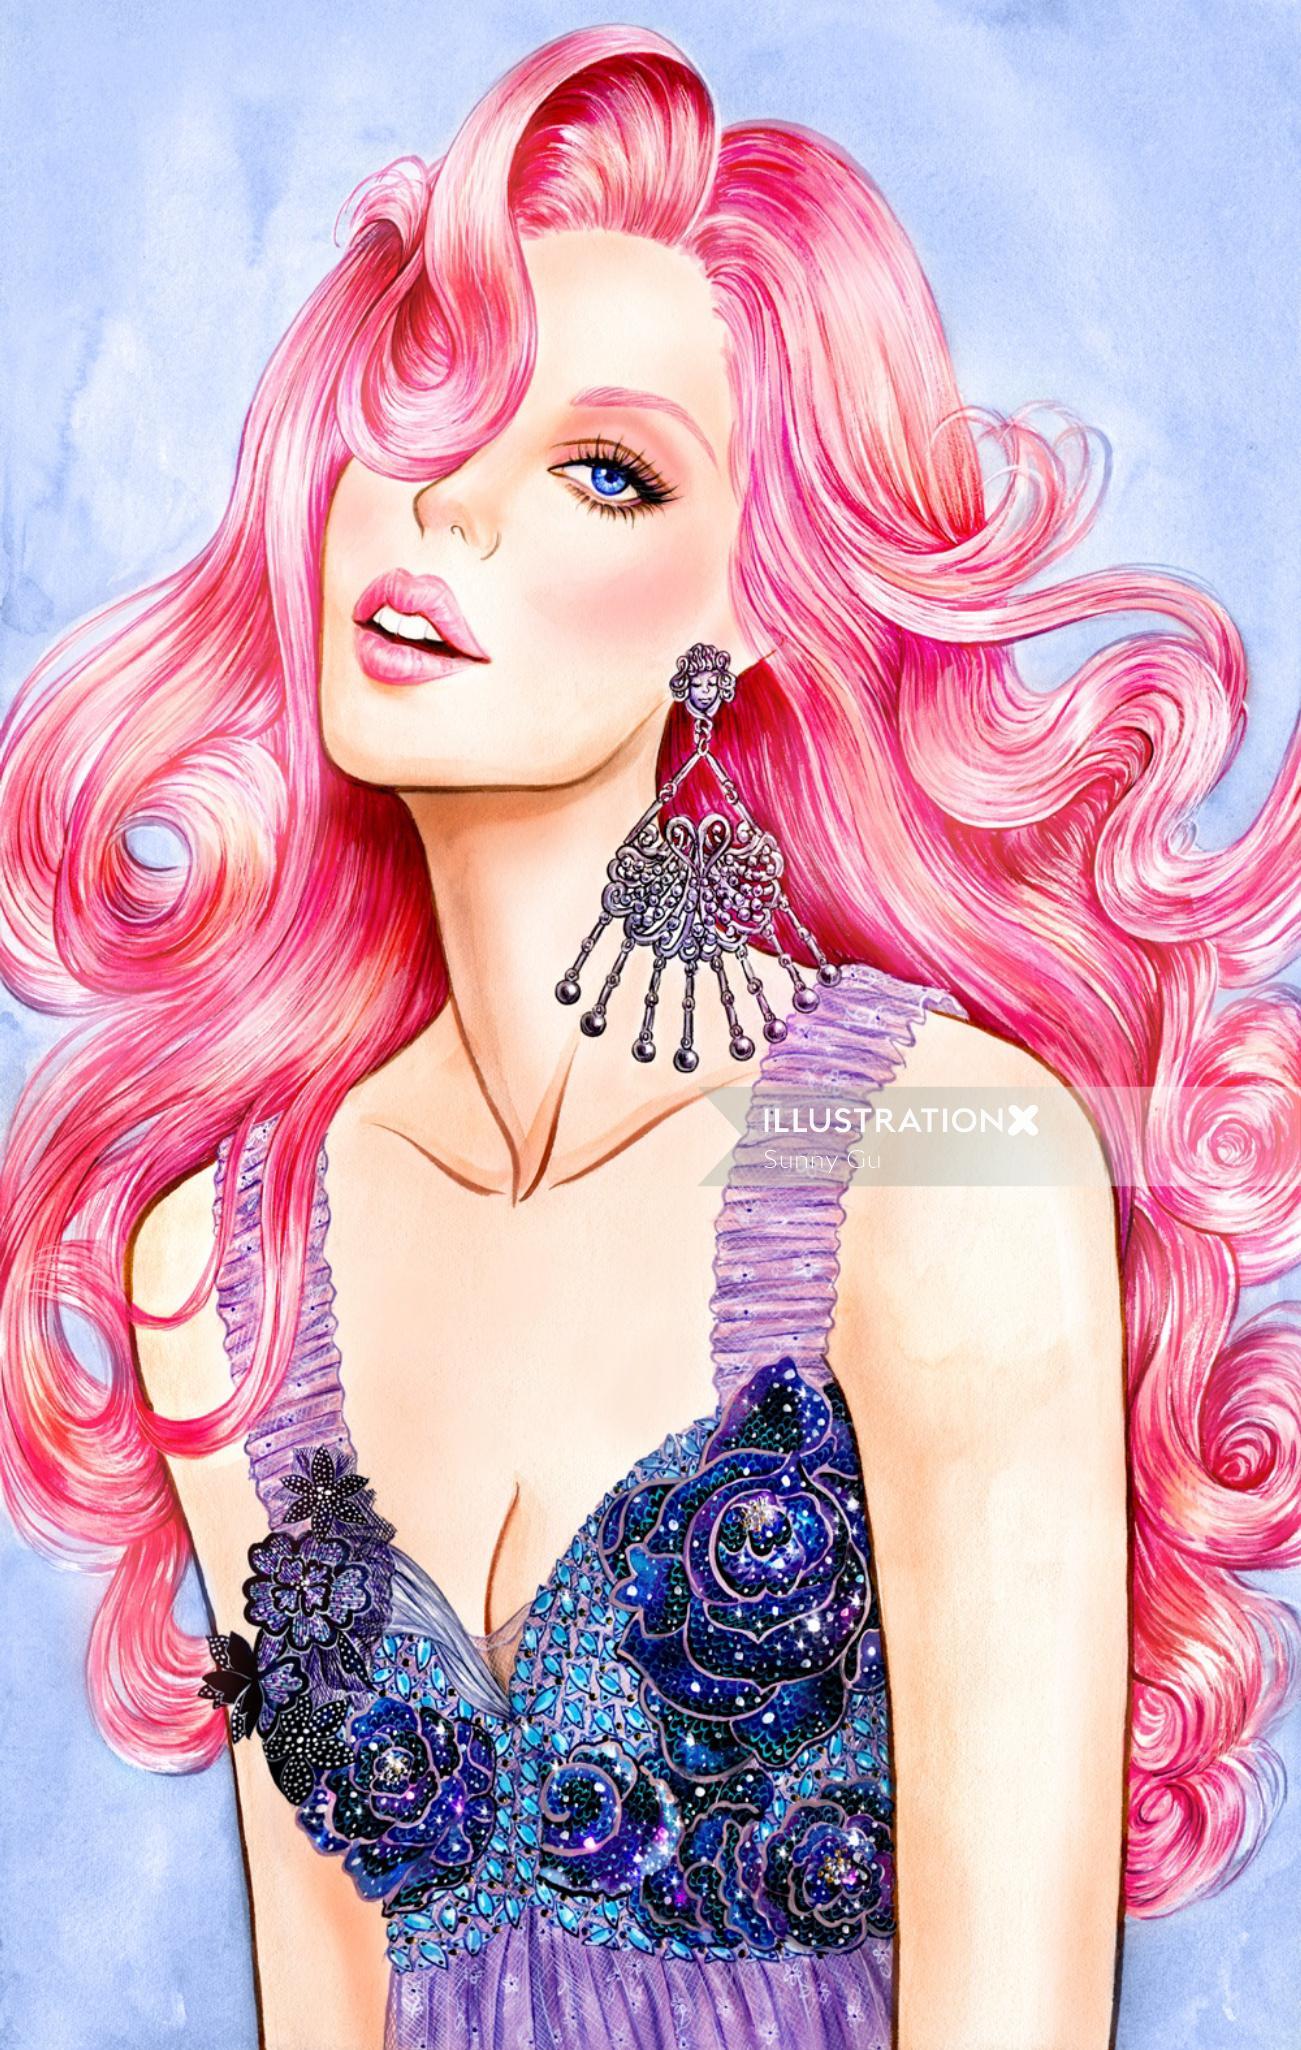 Glamorous lady acrylic painting by Los Angeles based illustrator